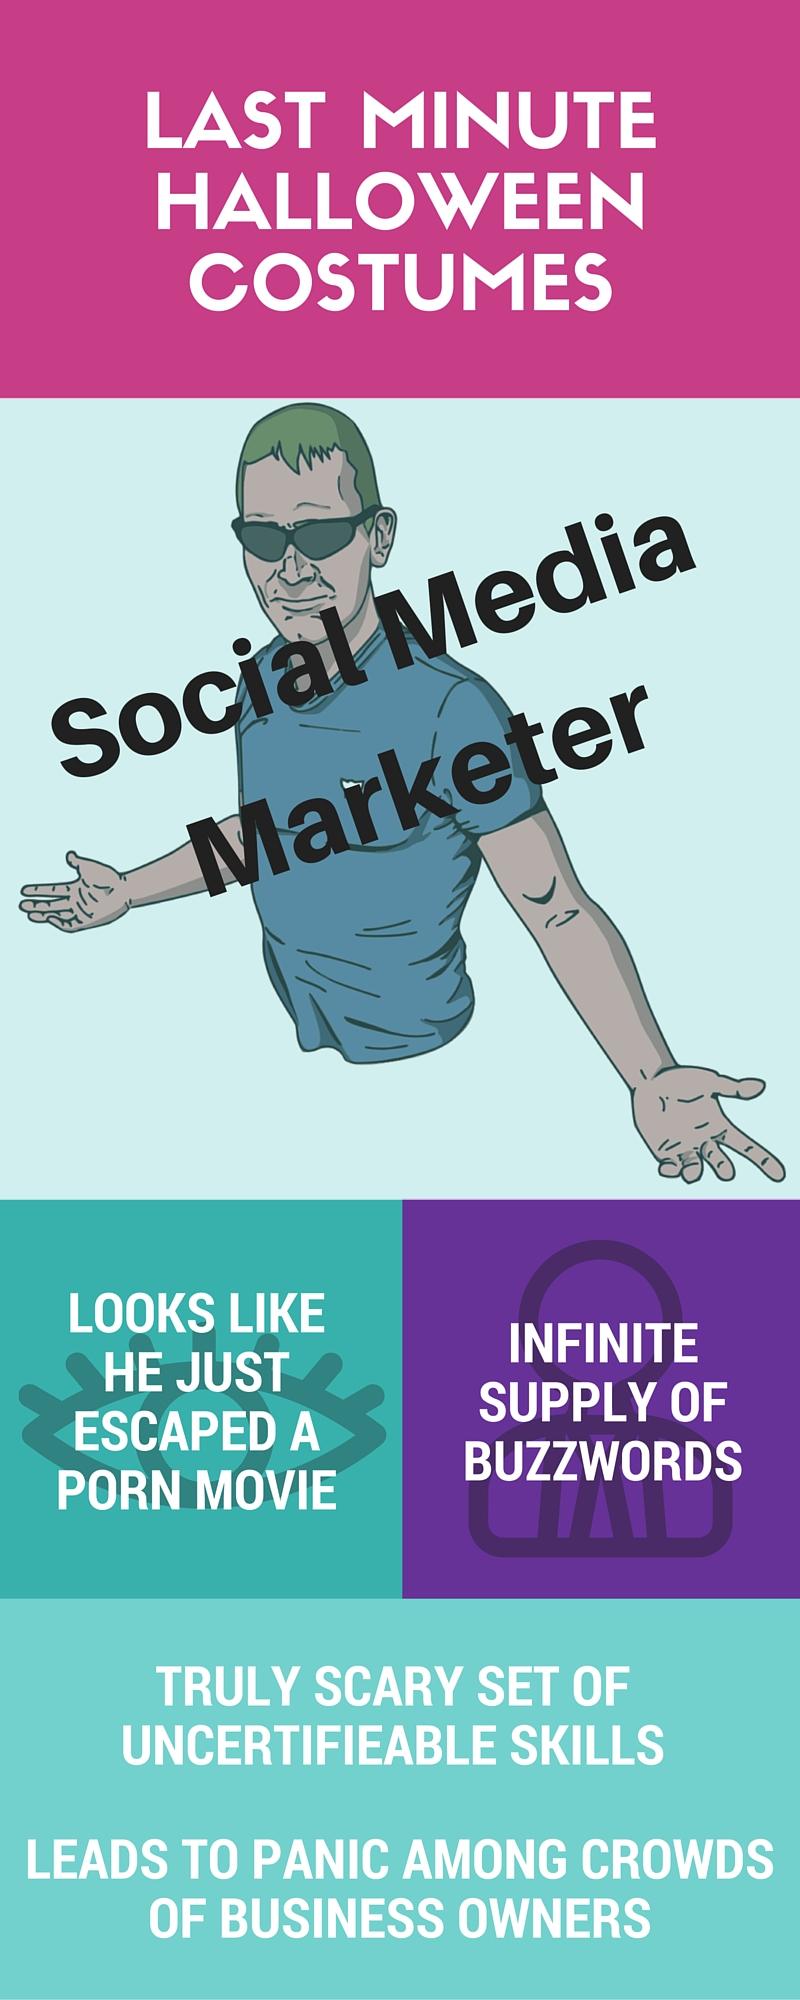 Social Marketer Halloween